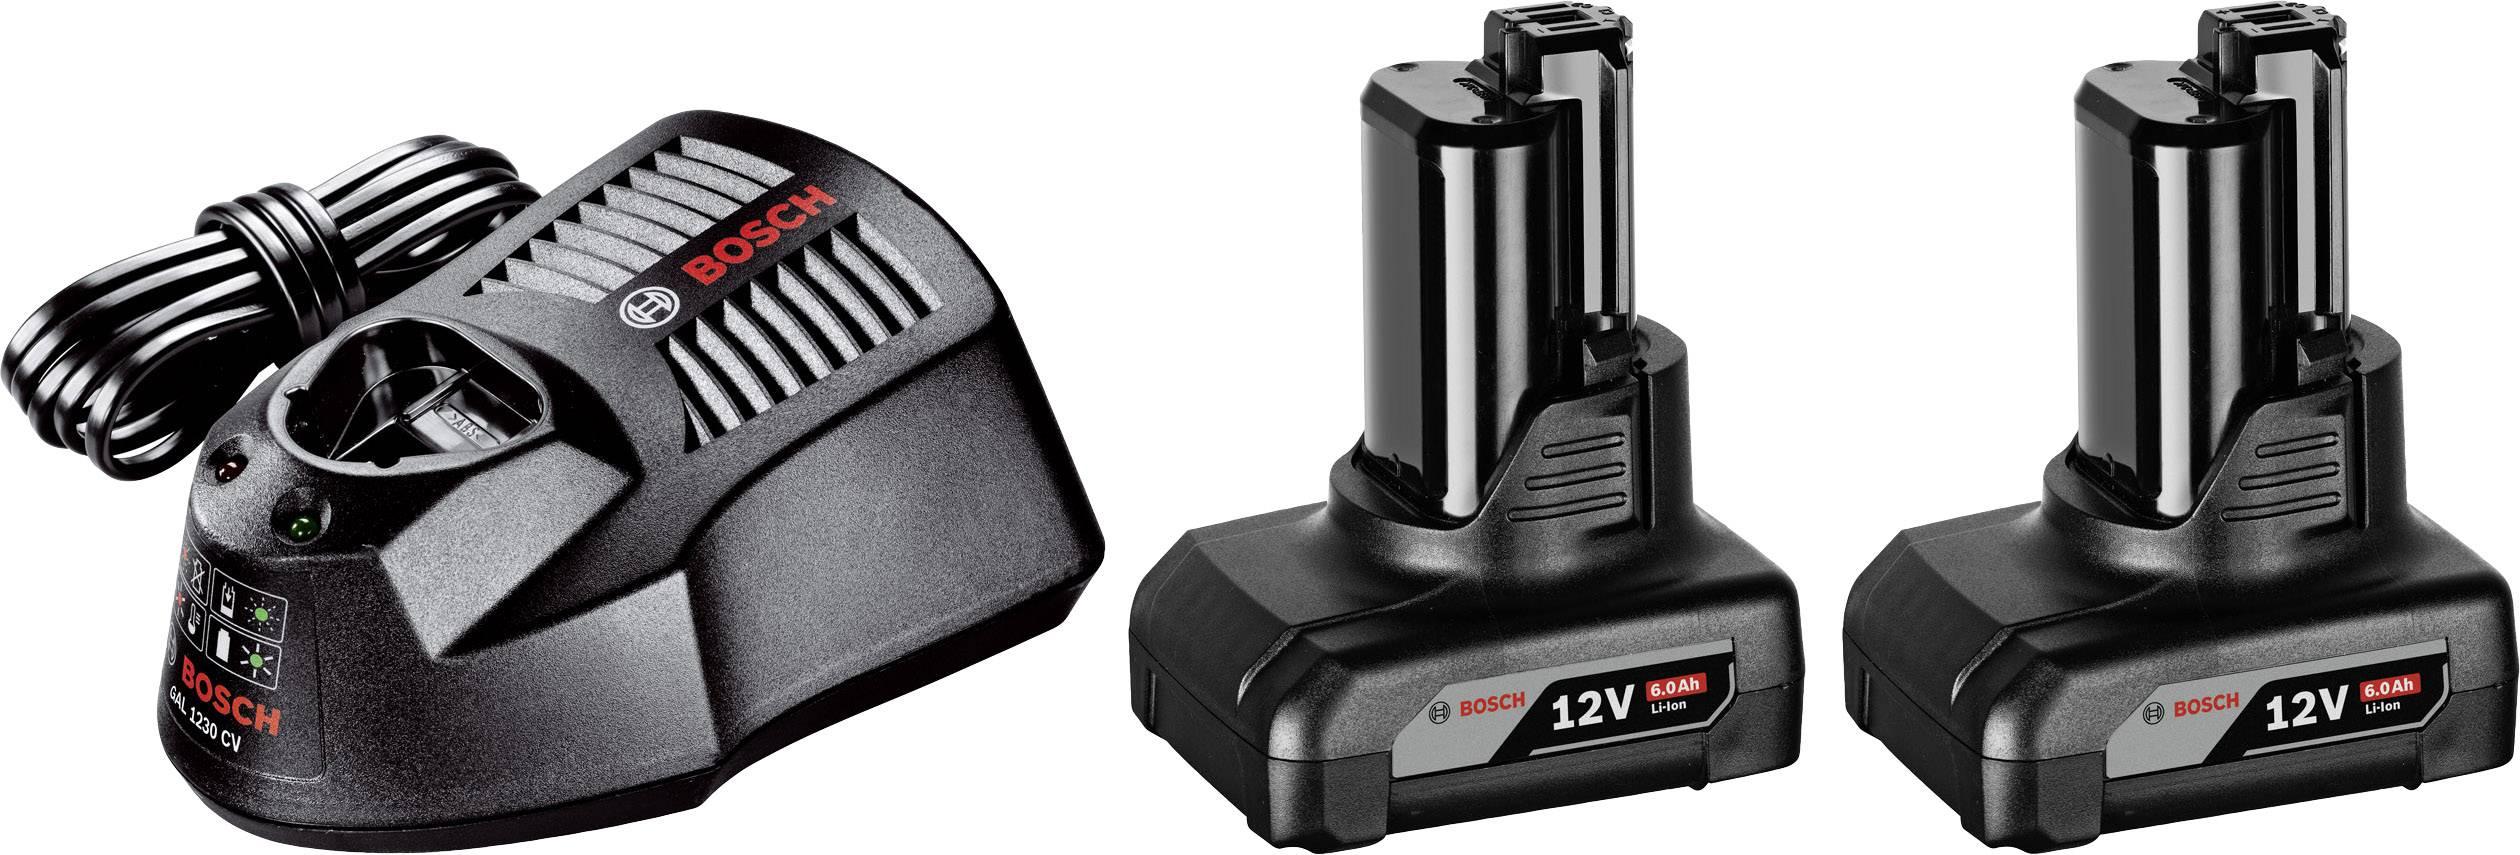 Náhradní akumulátor pro elektrické nářadí, Bosch Professional GBA 1600A00X7N, 12 V, 6 Ah, Li-Ion akumulátor